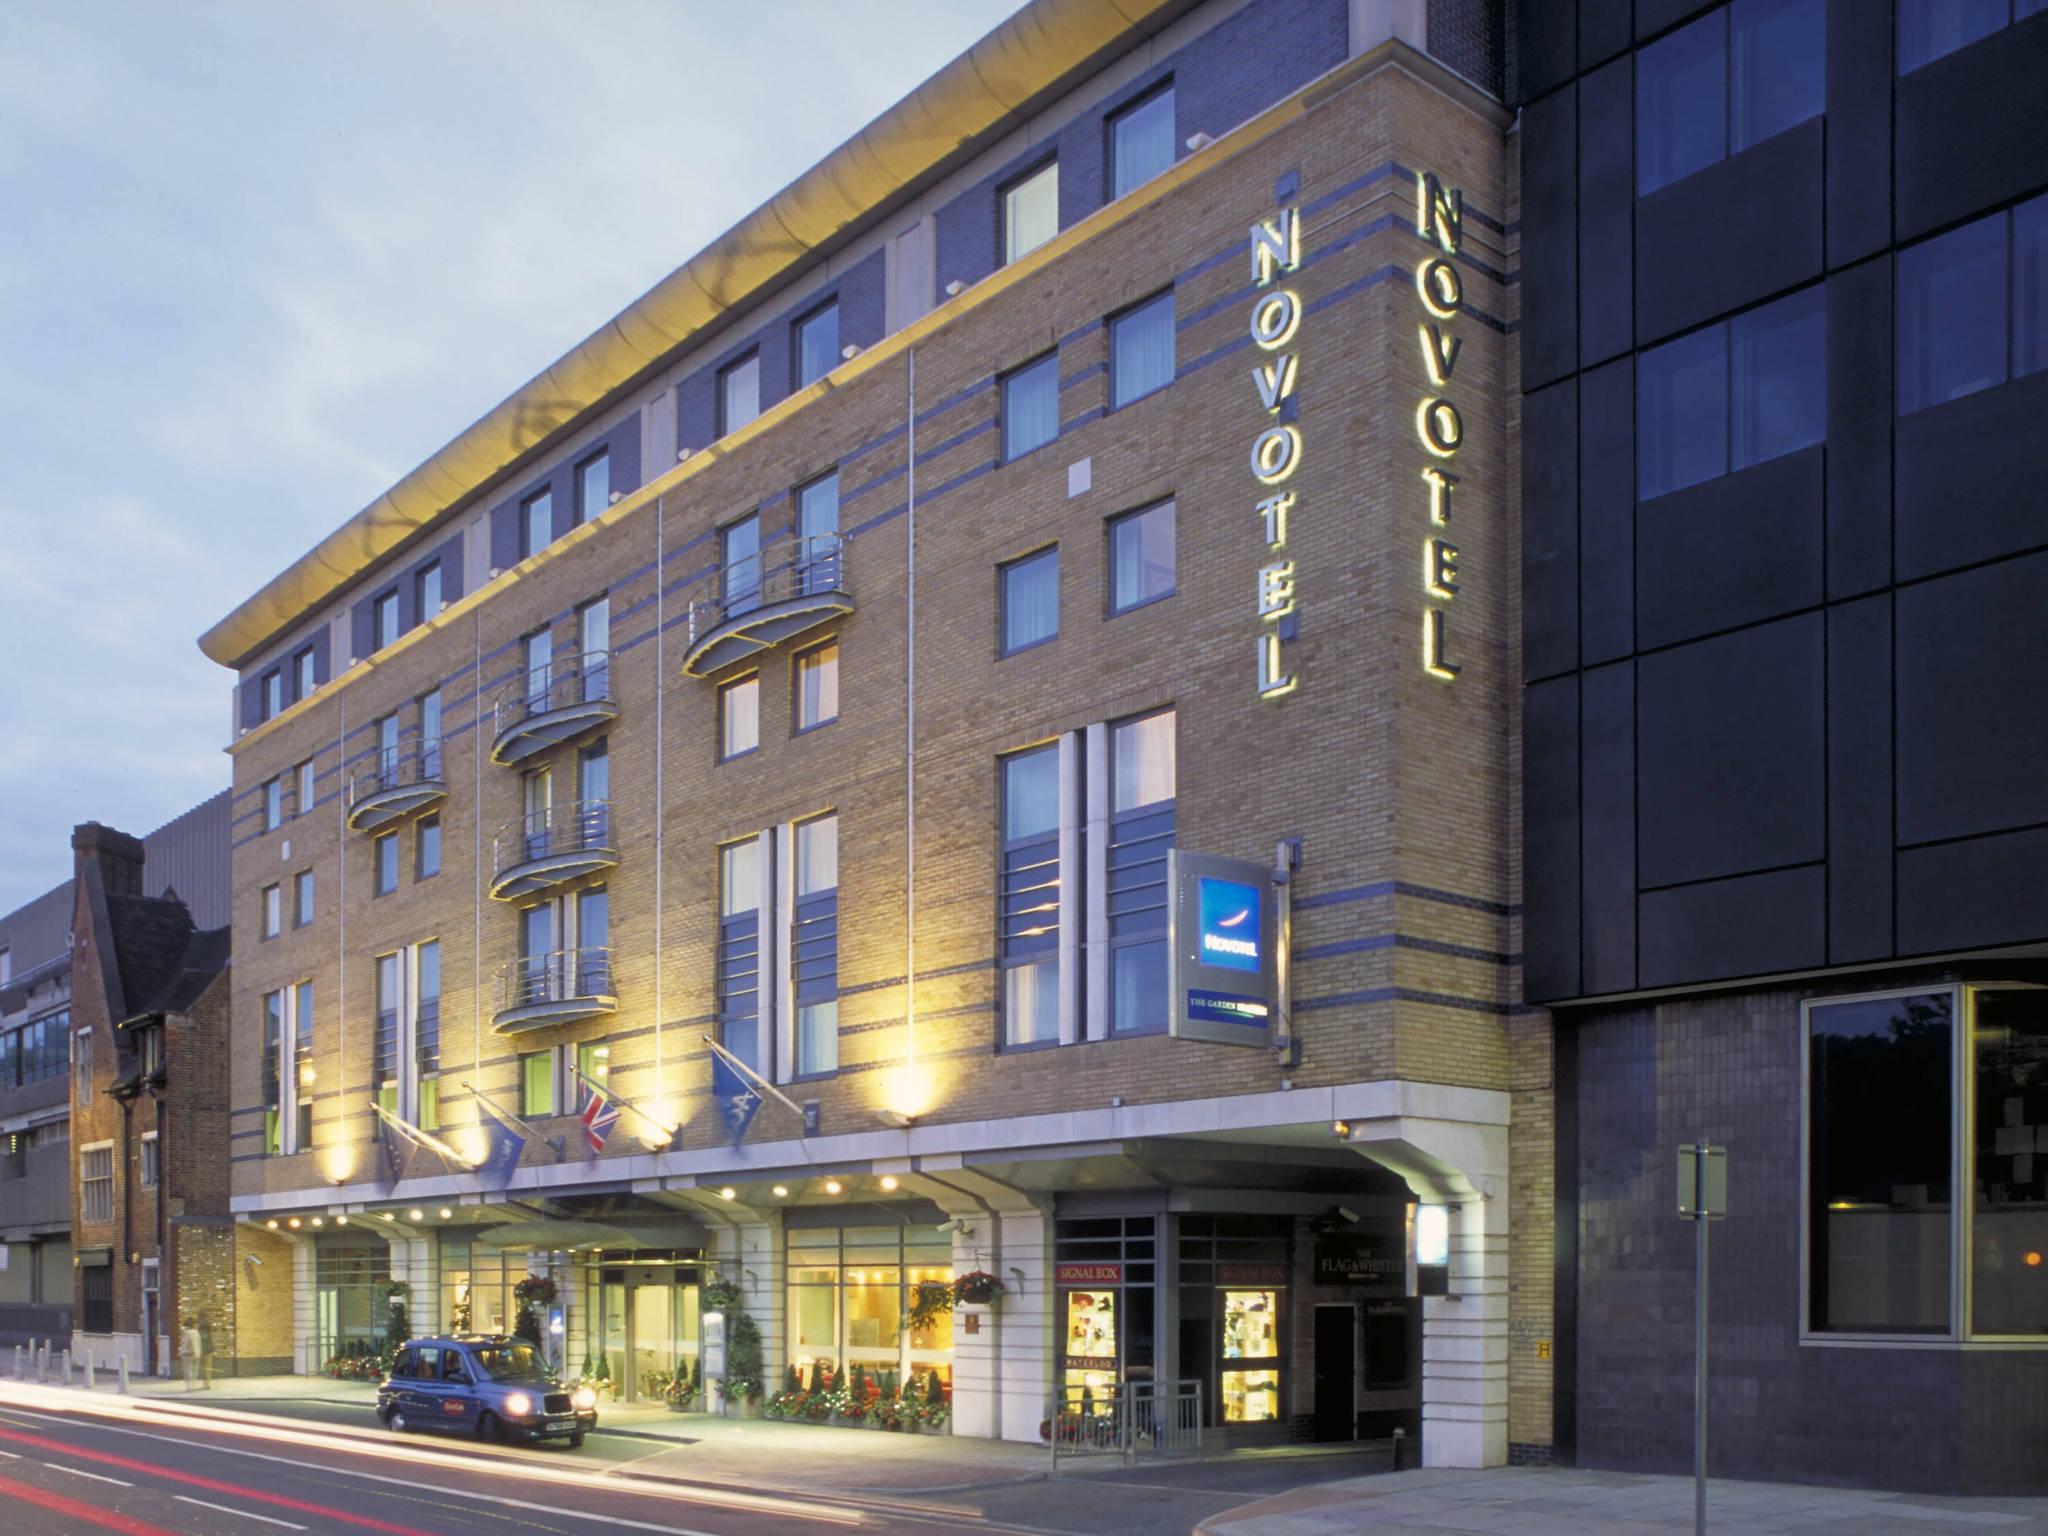 Hotell – Novotel London Waterloo